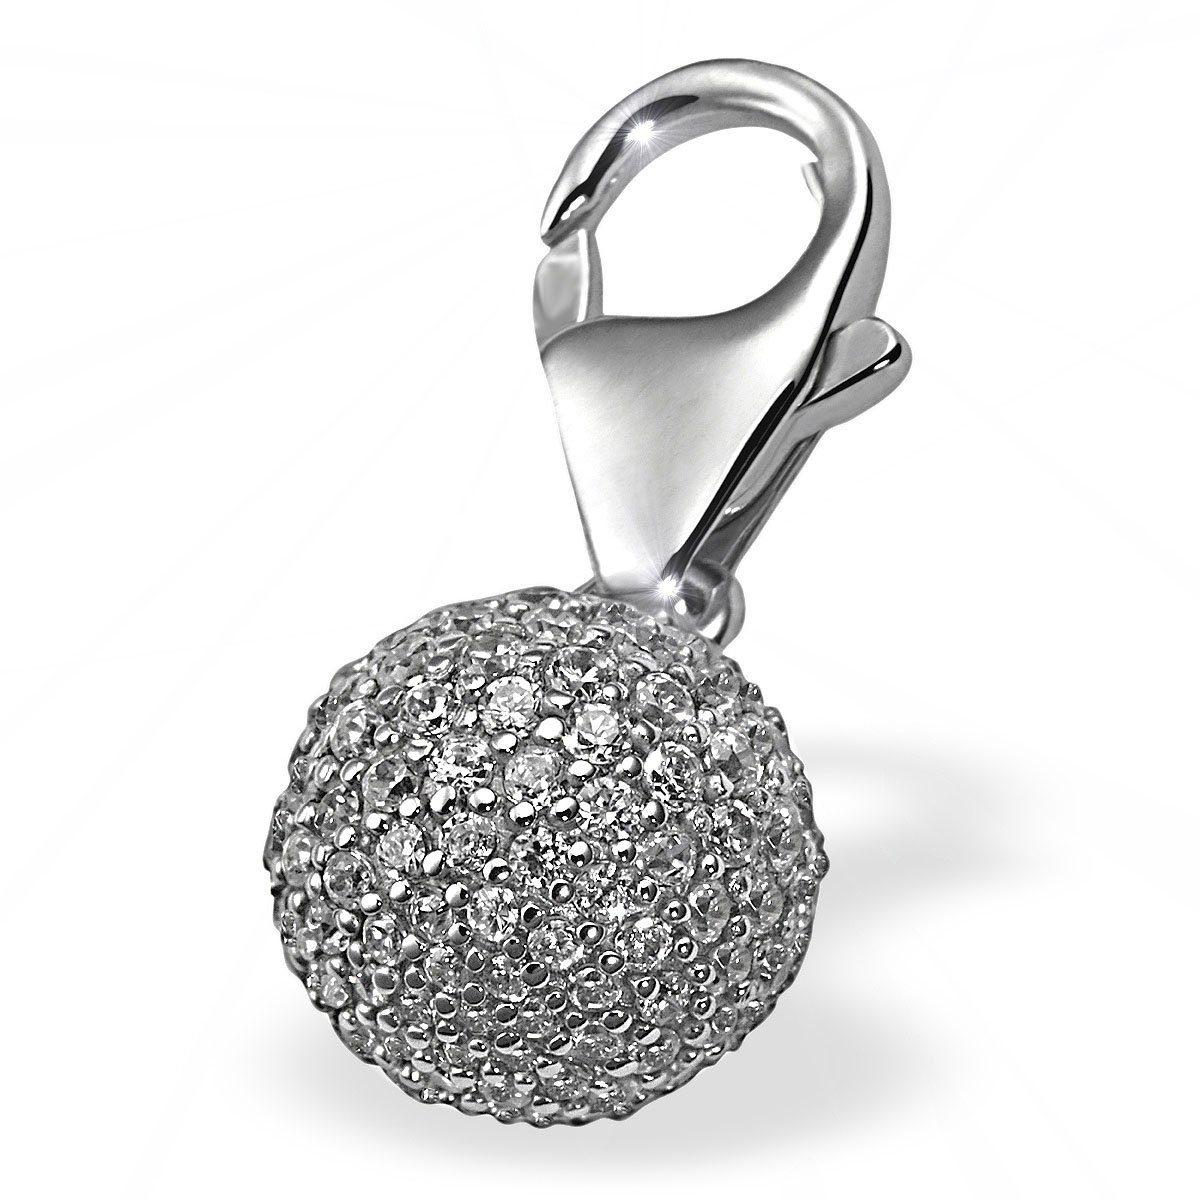 Averdin Charm Silber 925/- Kugel mit 151 Zirkonia